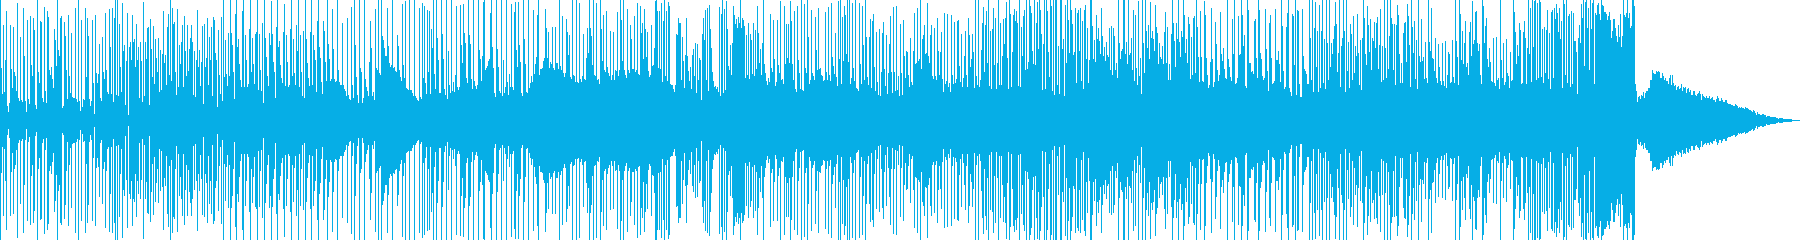 【CM】車・機械の音で製作したビートの再生済みの波形